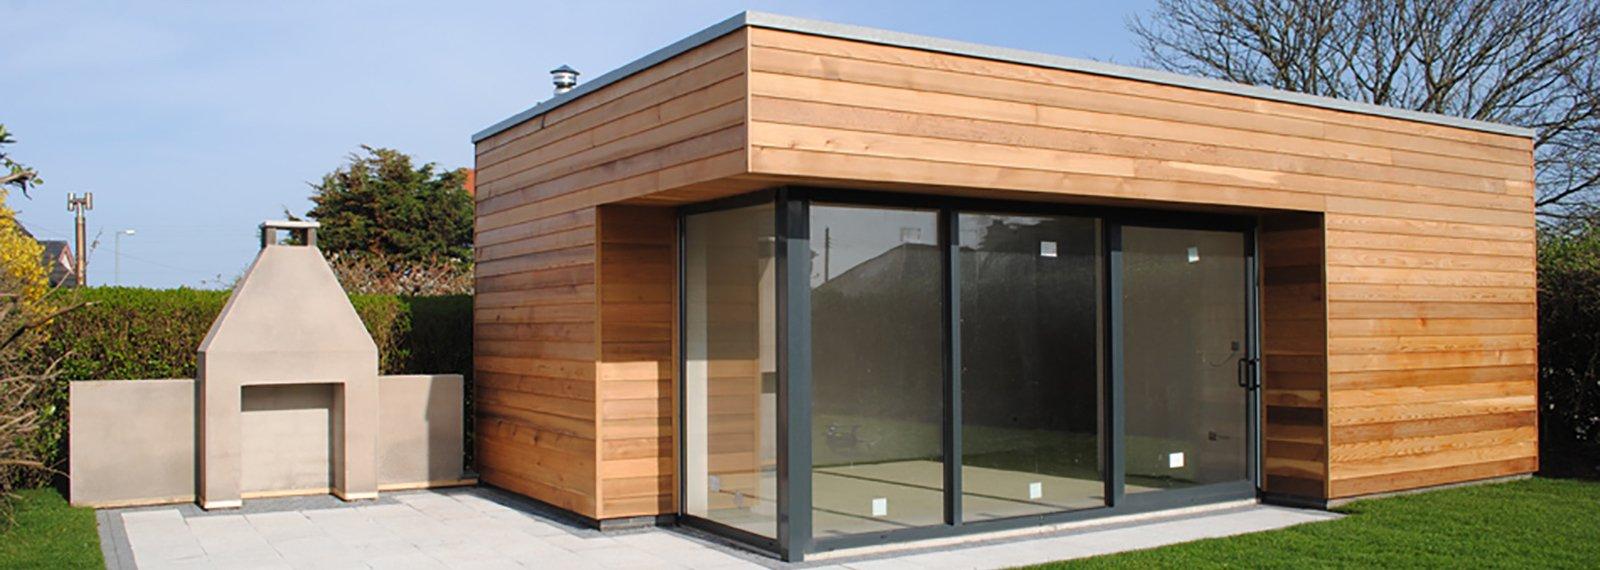 Studio Bureau De Jardin, Extension Maison Bois, Pool House tout Abri De Jardin Habitable